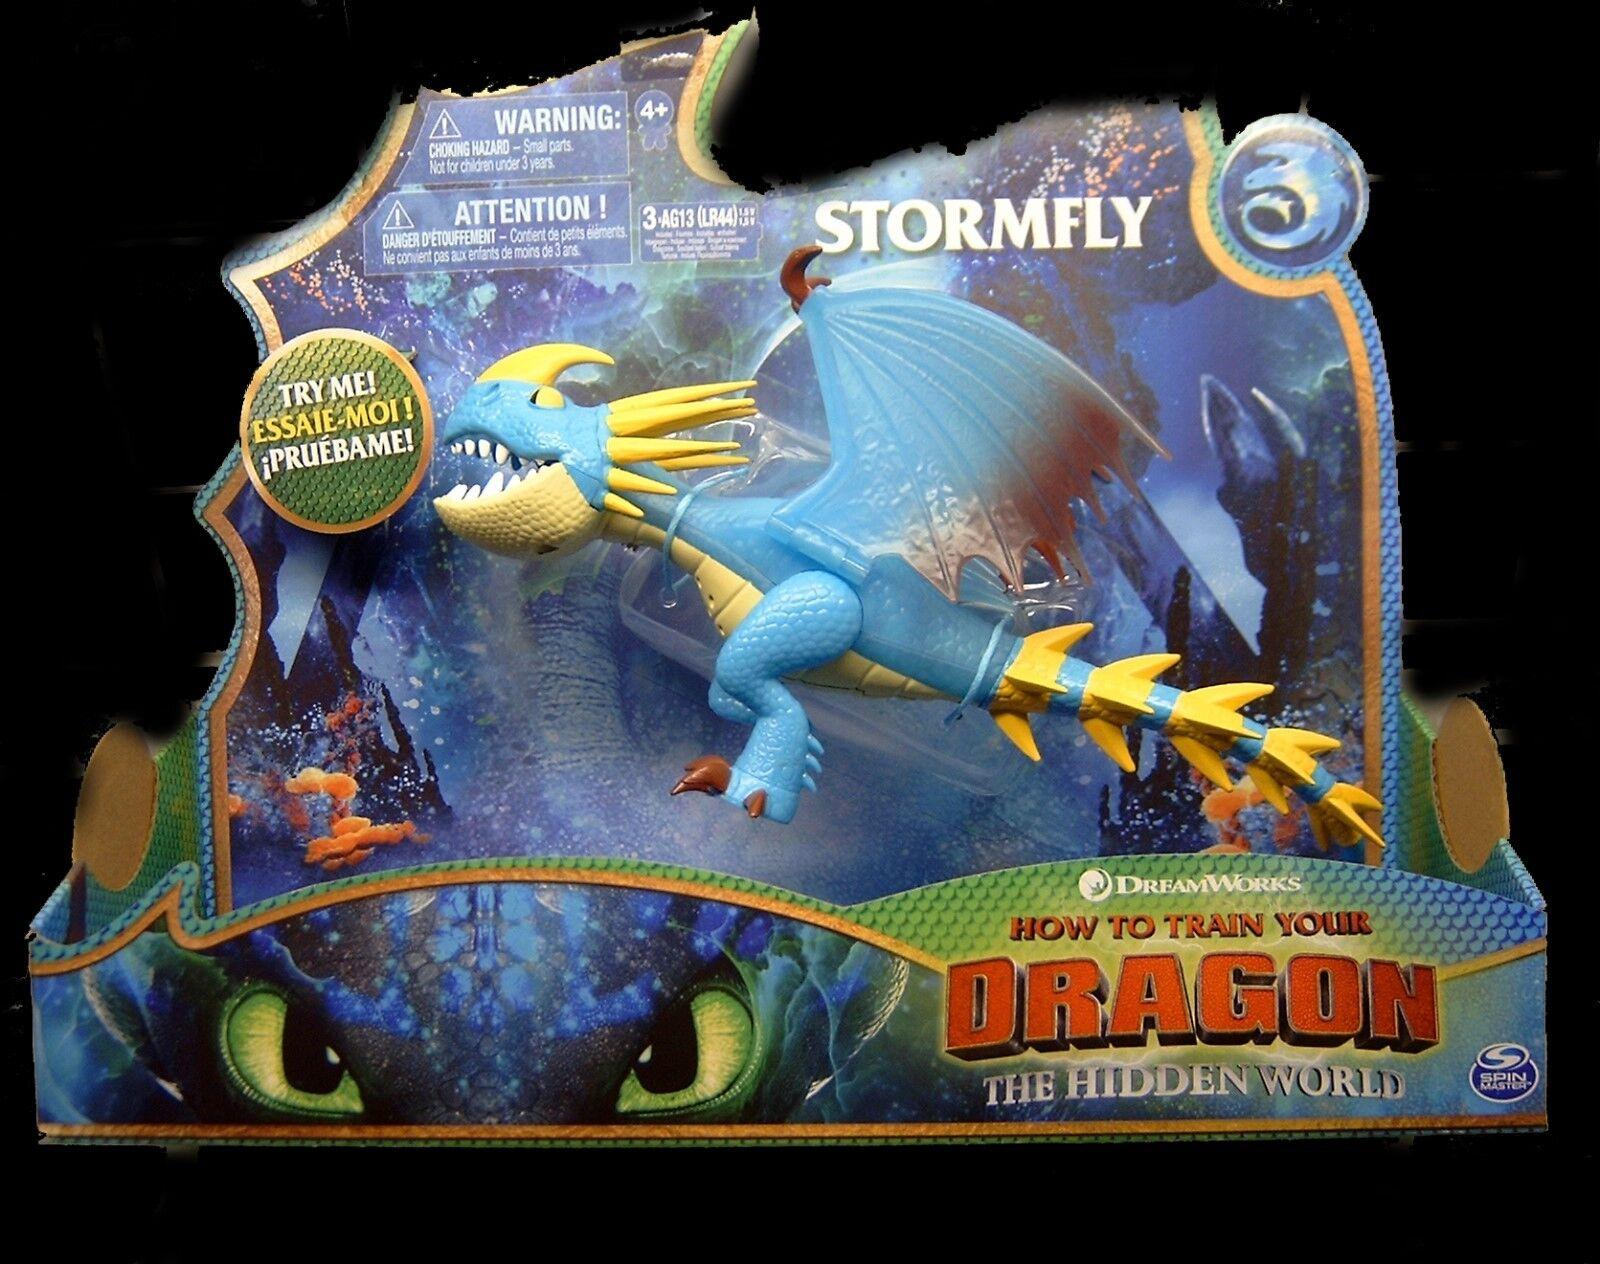 Dragons 3 - Die geheime Welt - Stormfly / Sturmpfeil Deluxe Light Sound NEU/OVP